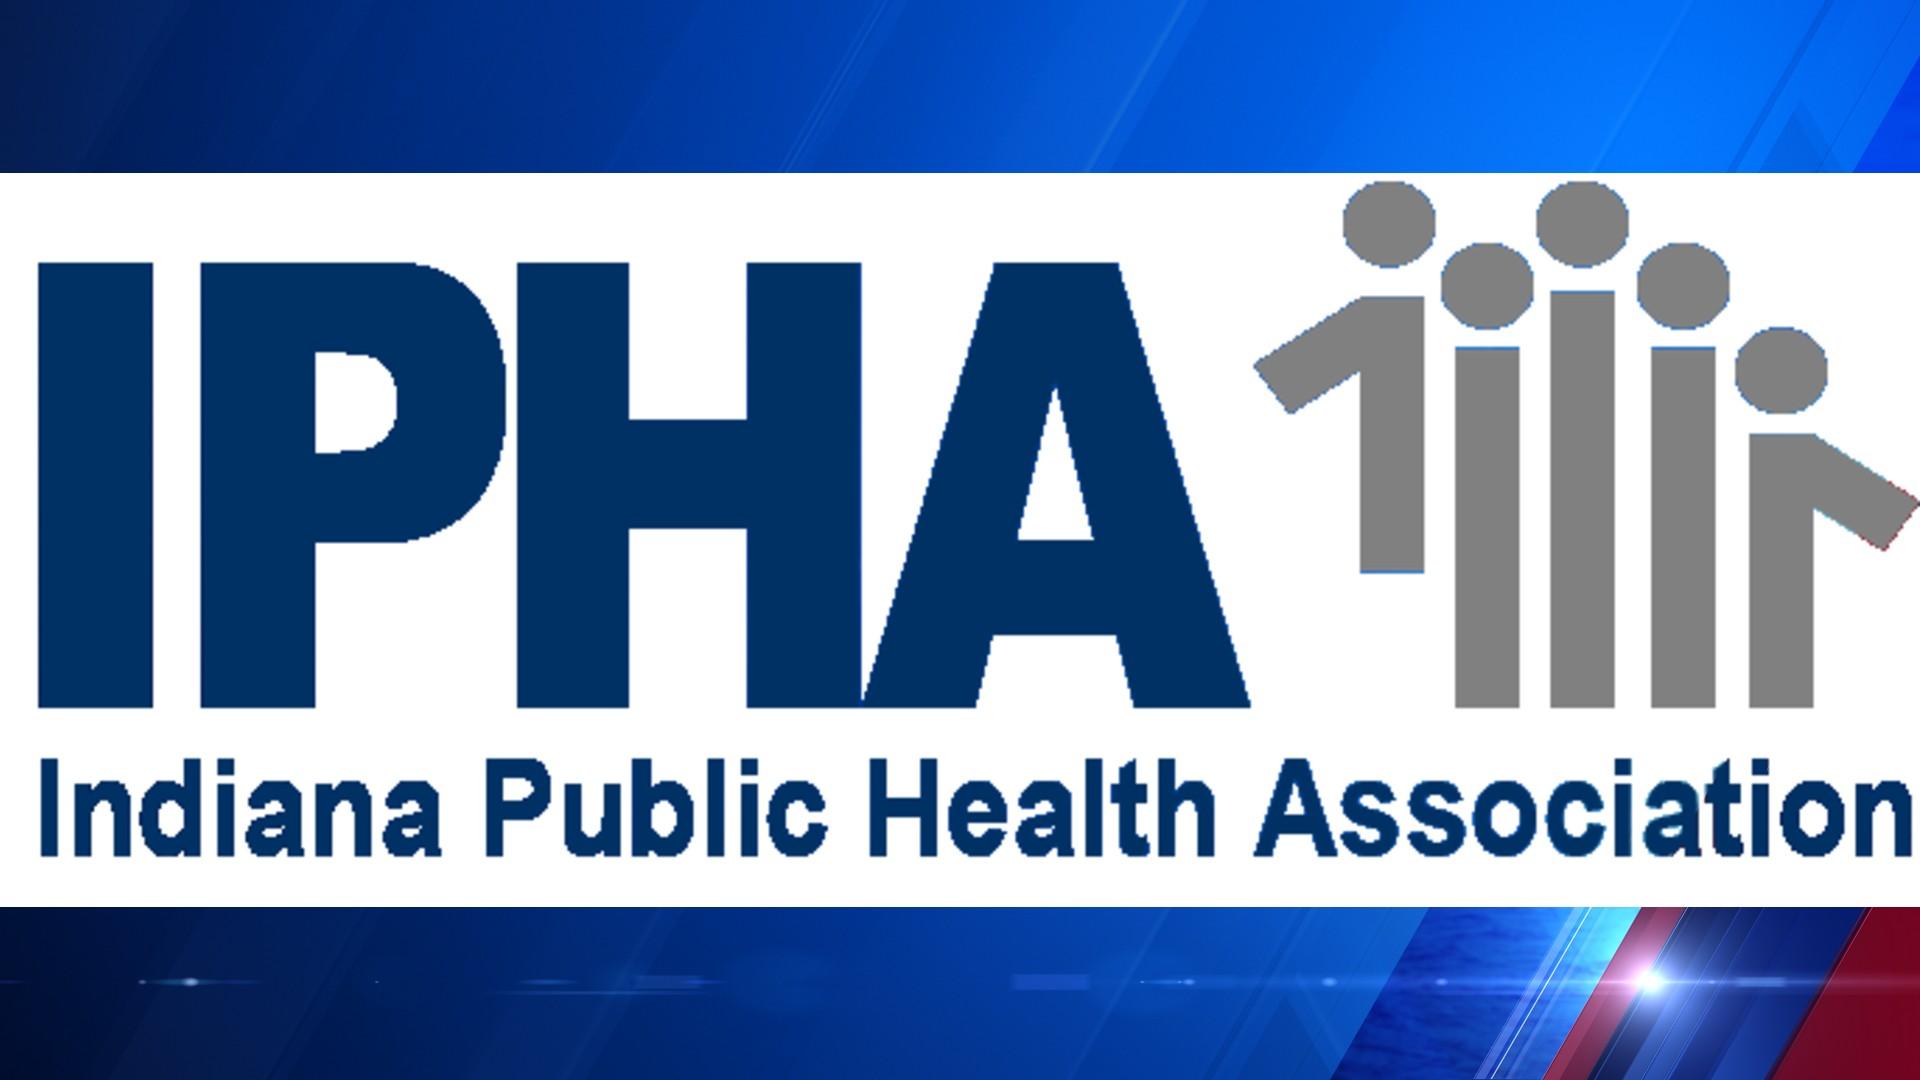 INDIANA Public Health Association